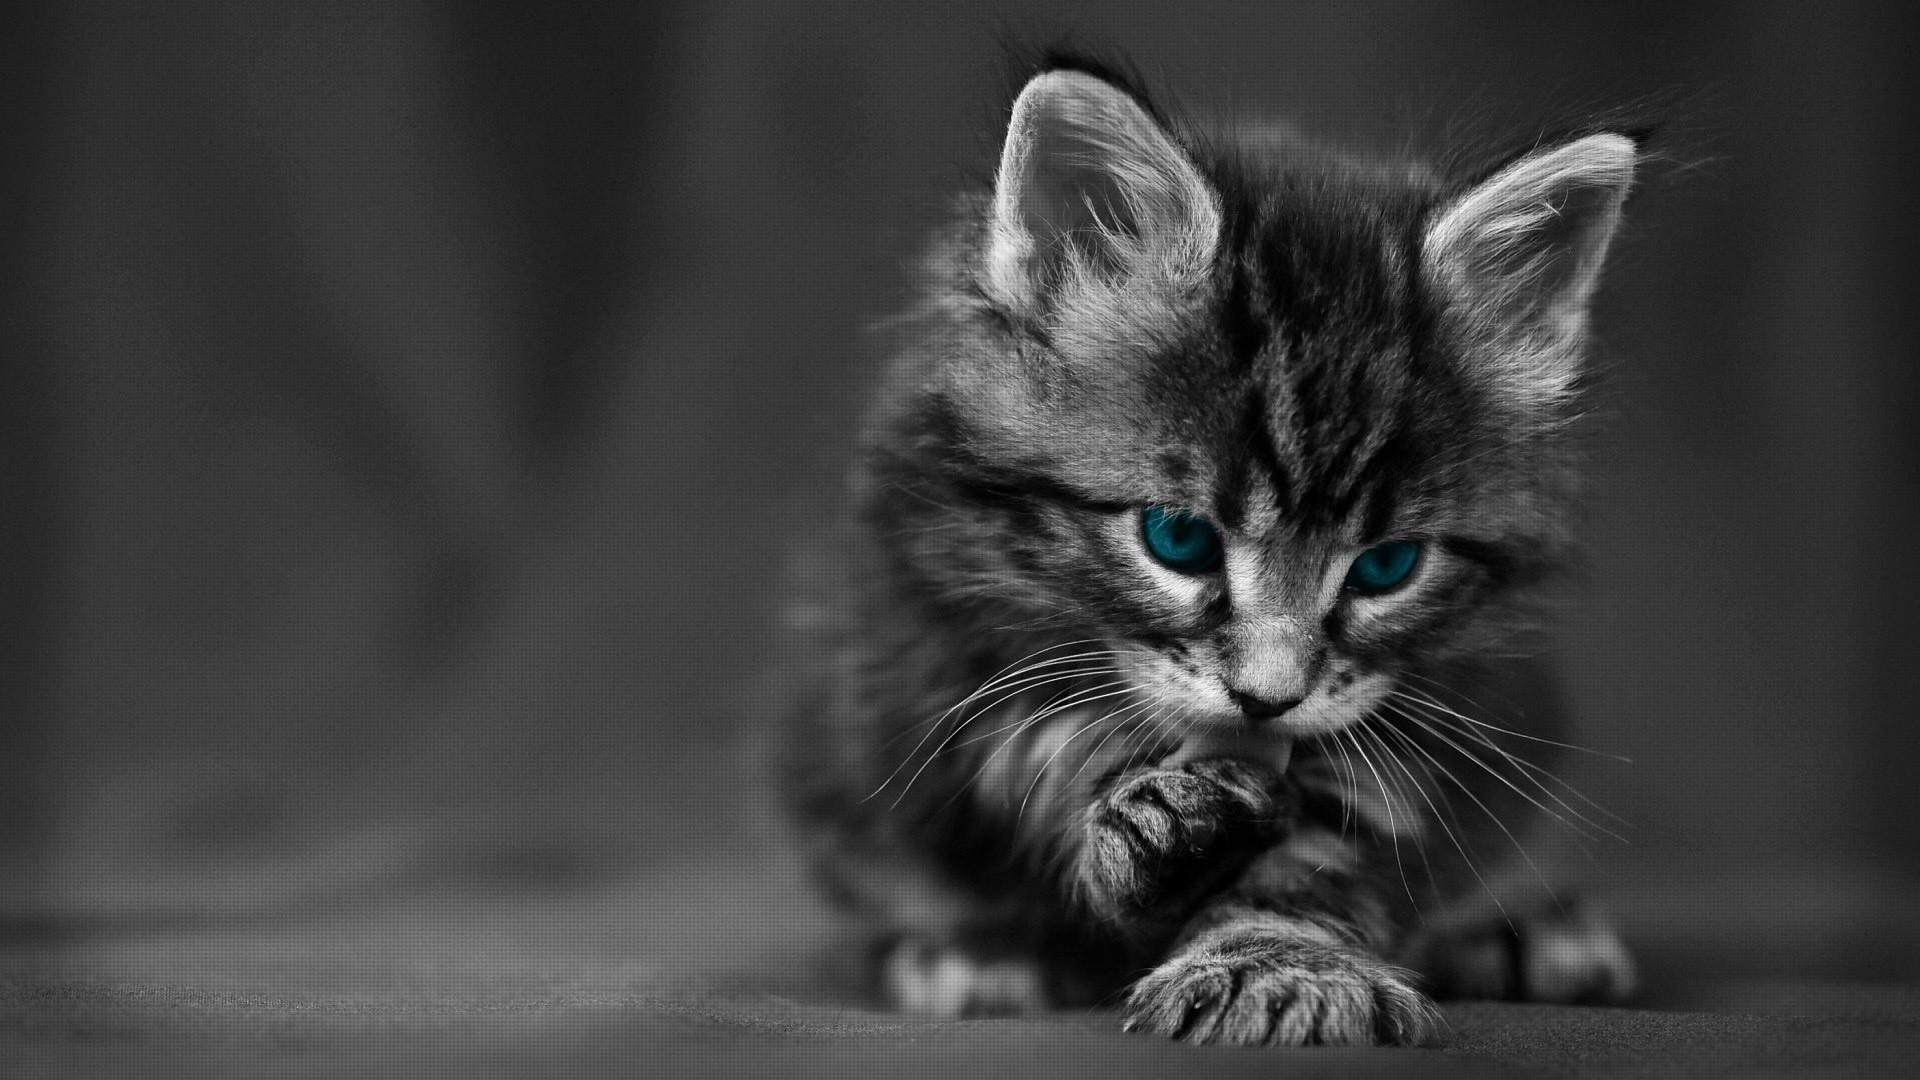 Cute Black Cat HD Desktop Wallpaper HD Desktop Wallpaper 1920x1080